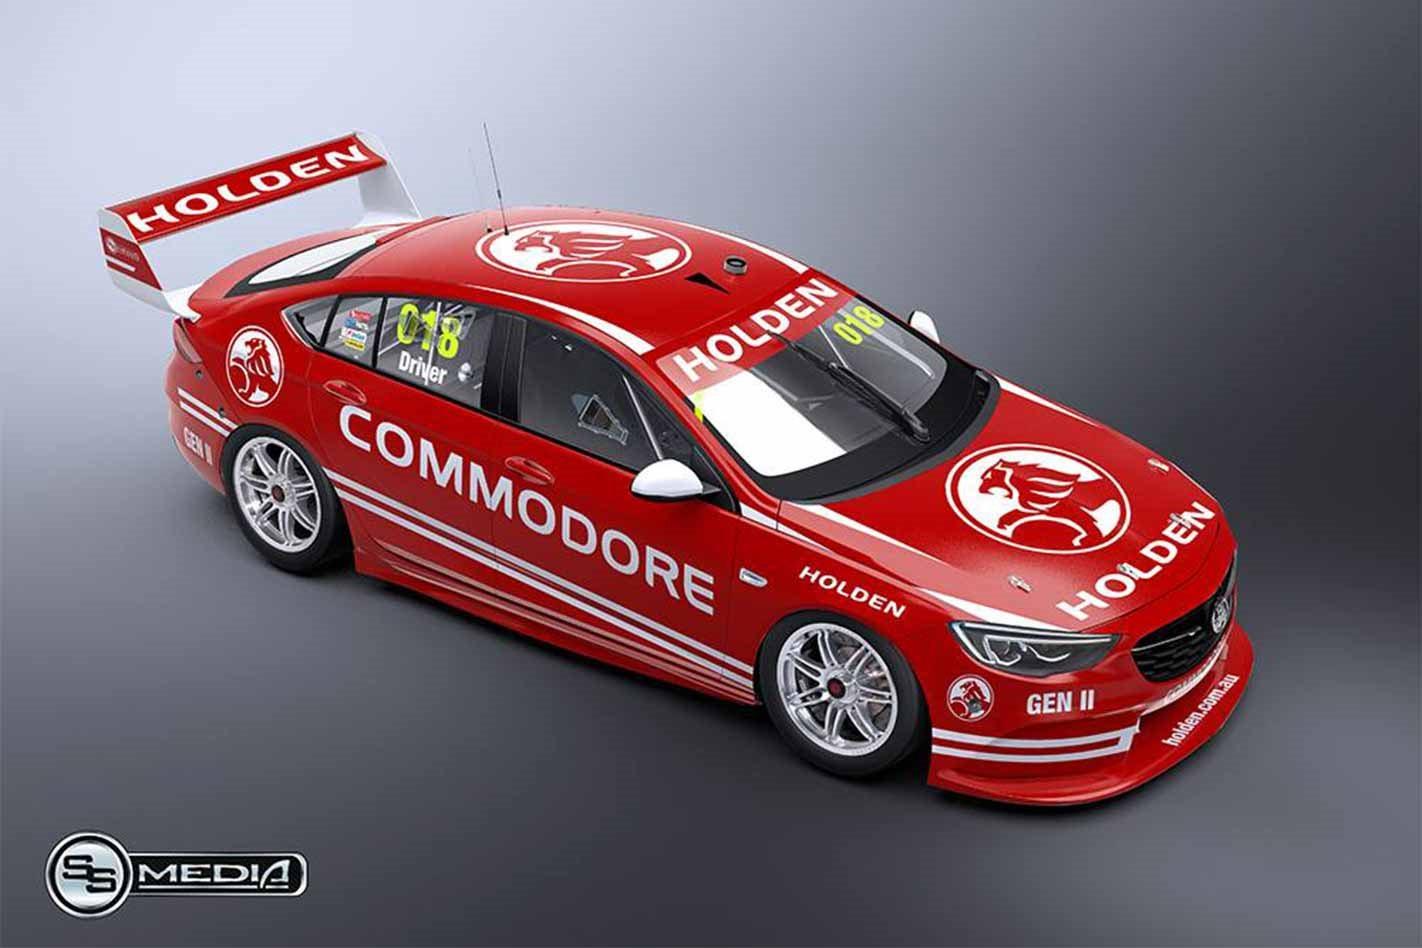 2018 Holden Commodore Supercar